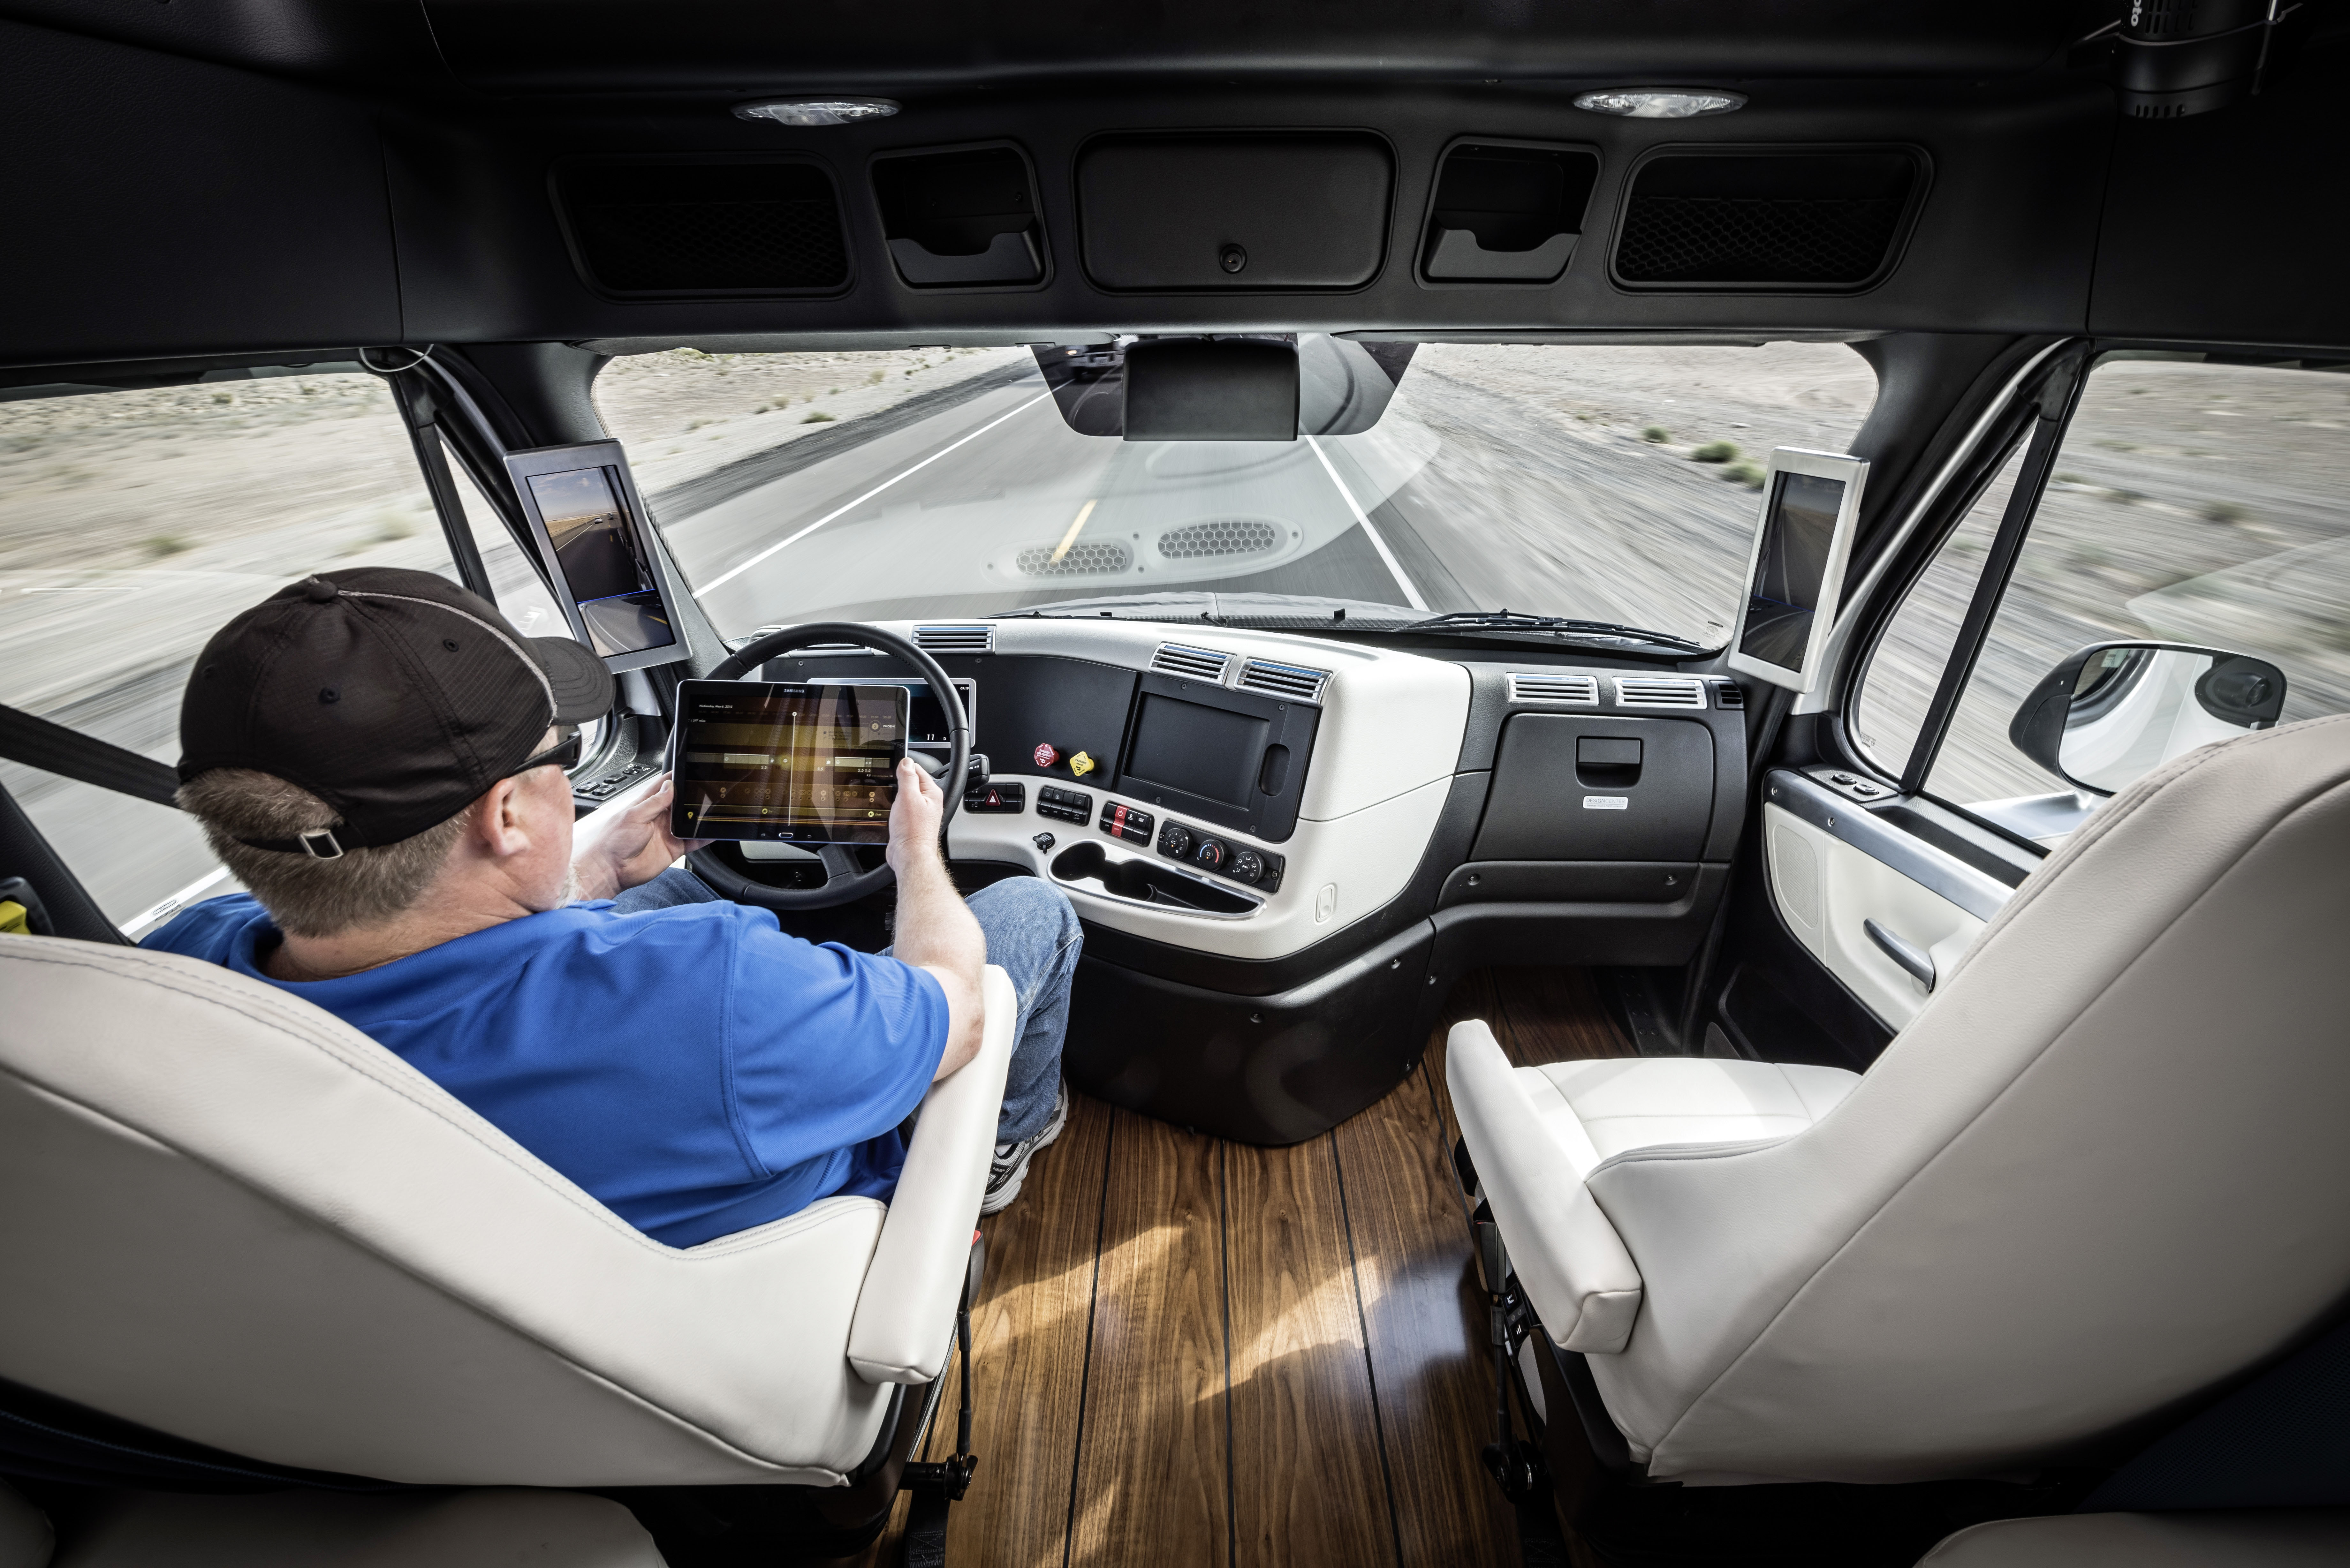 Truck con guida autonoma Daimler - Freightliner Inspiration Truck